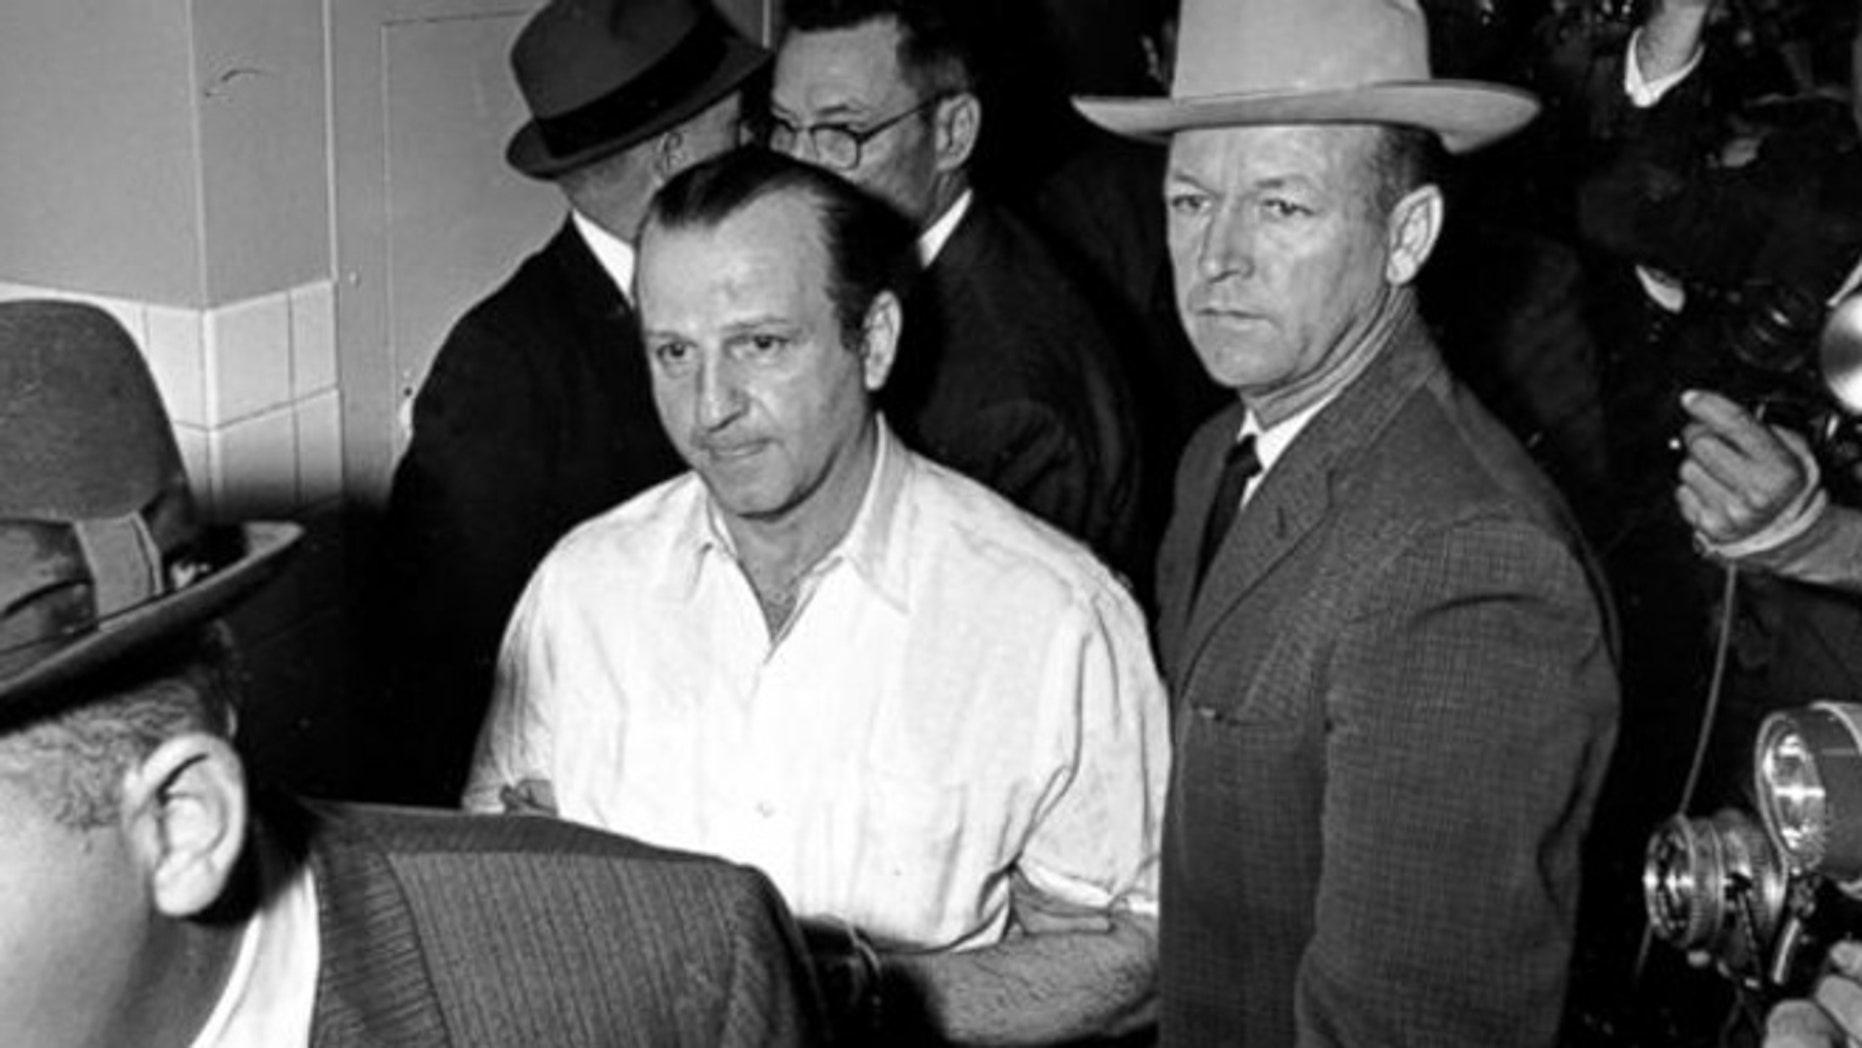 FILE: Nov. 23, 1963: Lee Harvey Oswald, Dallas, Texas.